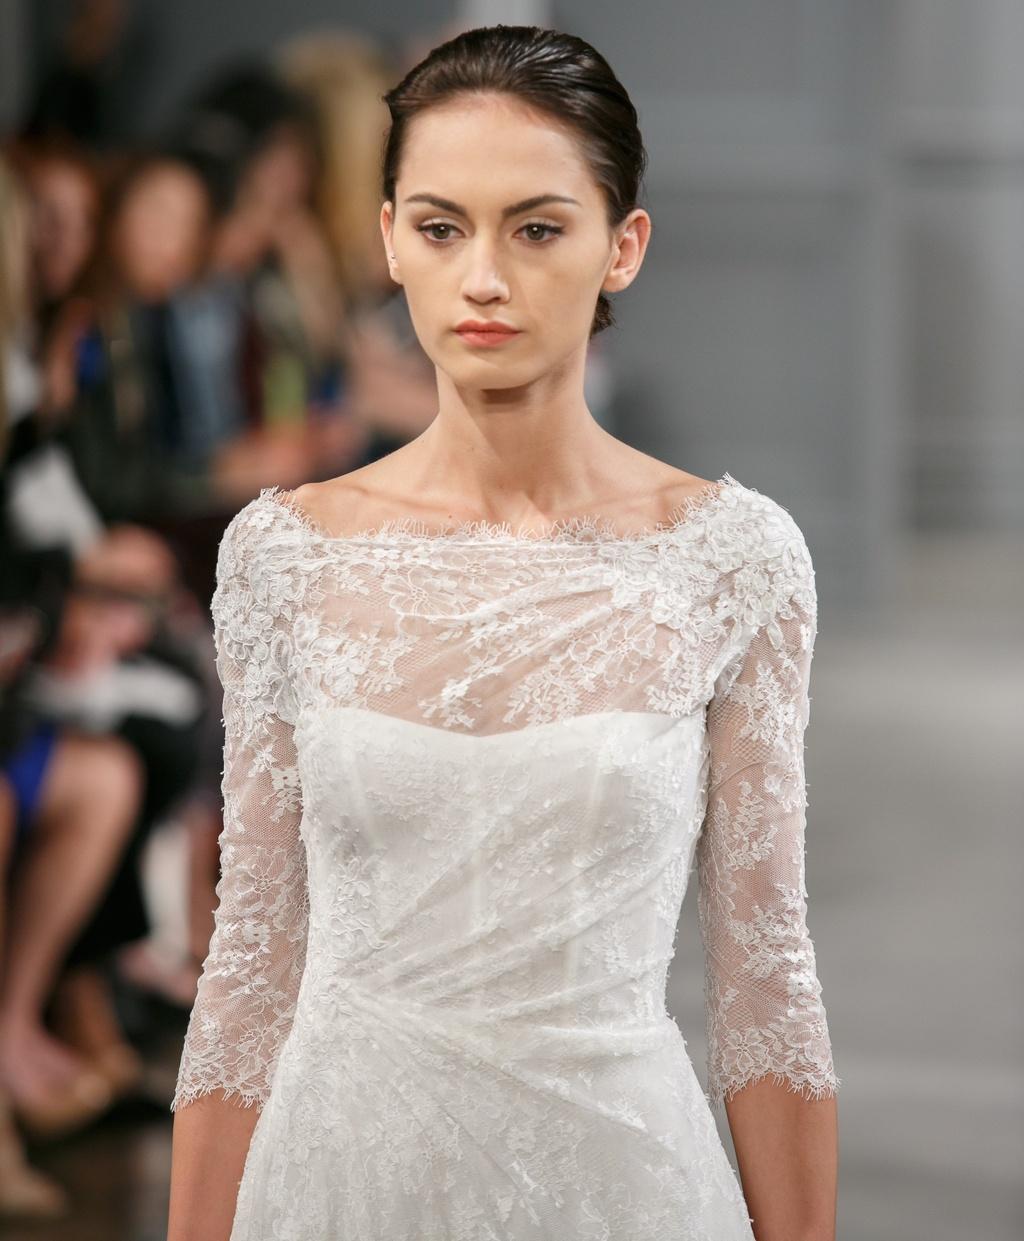 Spring-2014-wedding-dress-monique-lhuillier-bridal-vignette-2.full